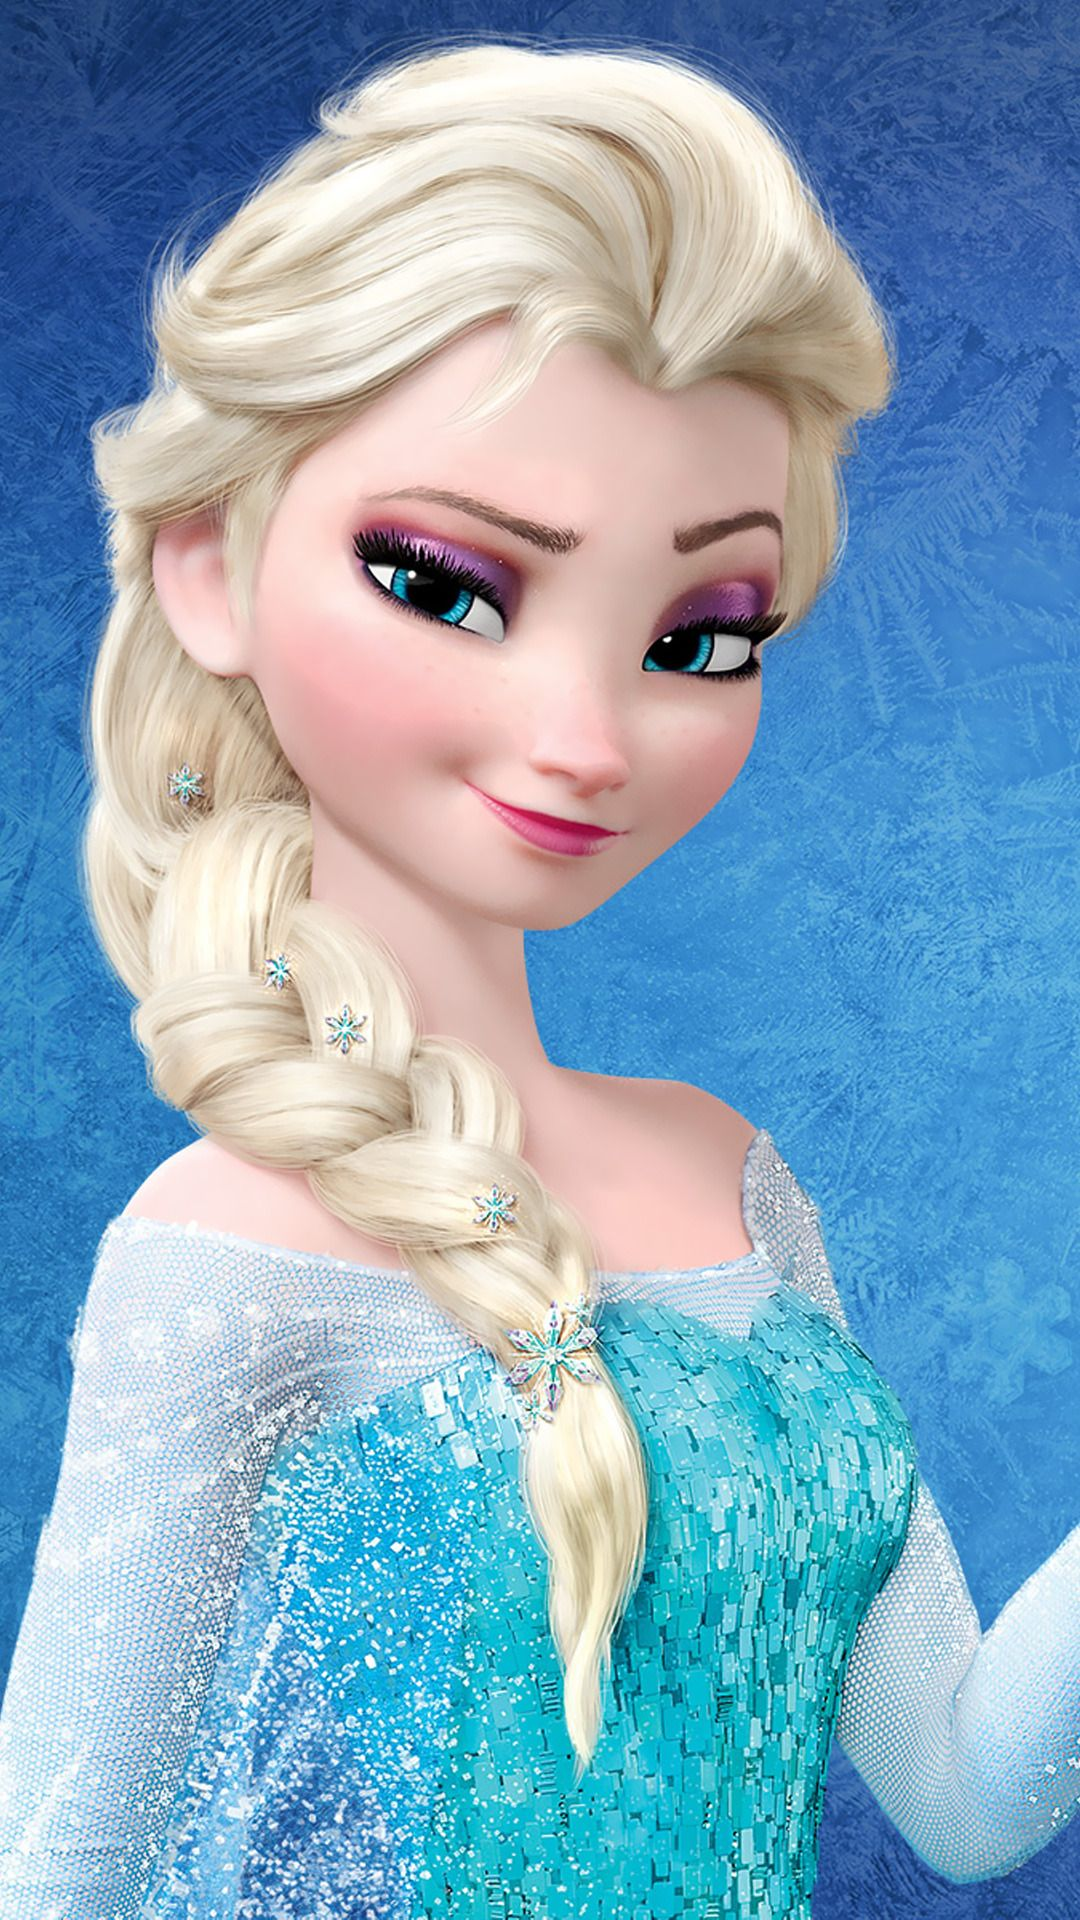 elsa frozen   Elsa - Frozen Mobile Wallpaper 3466